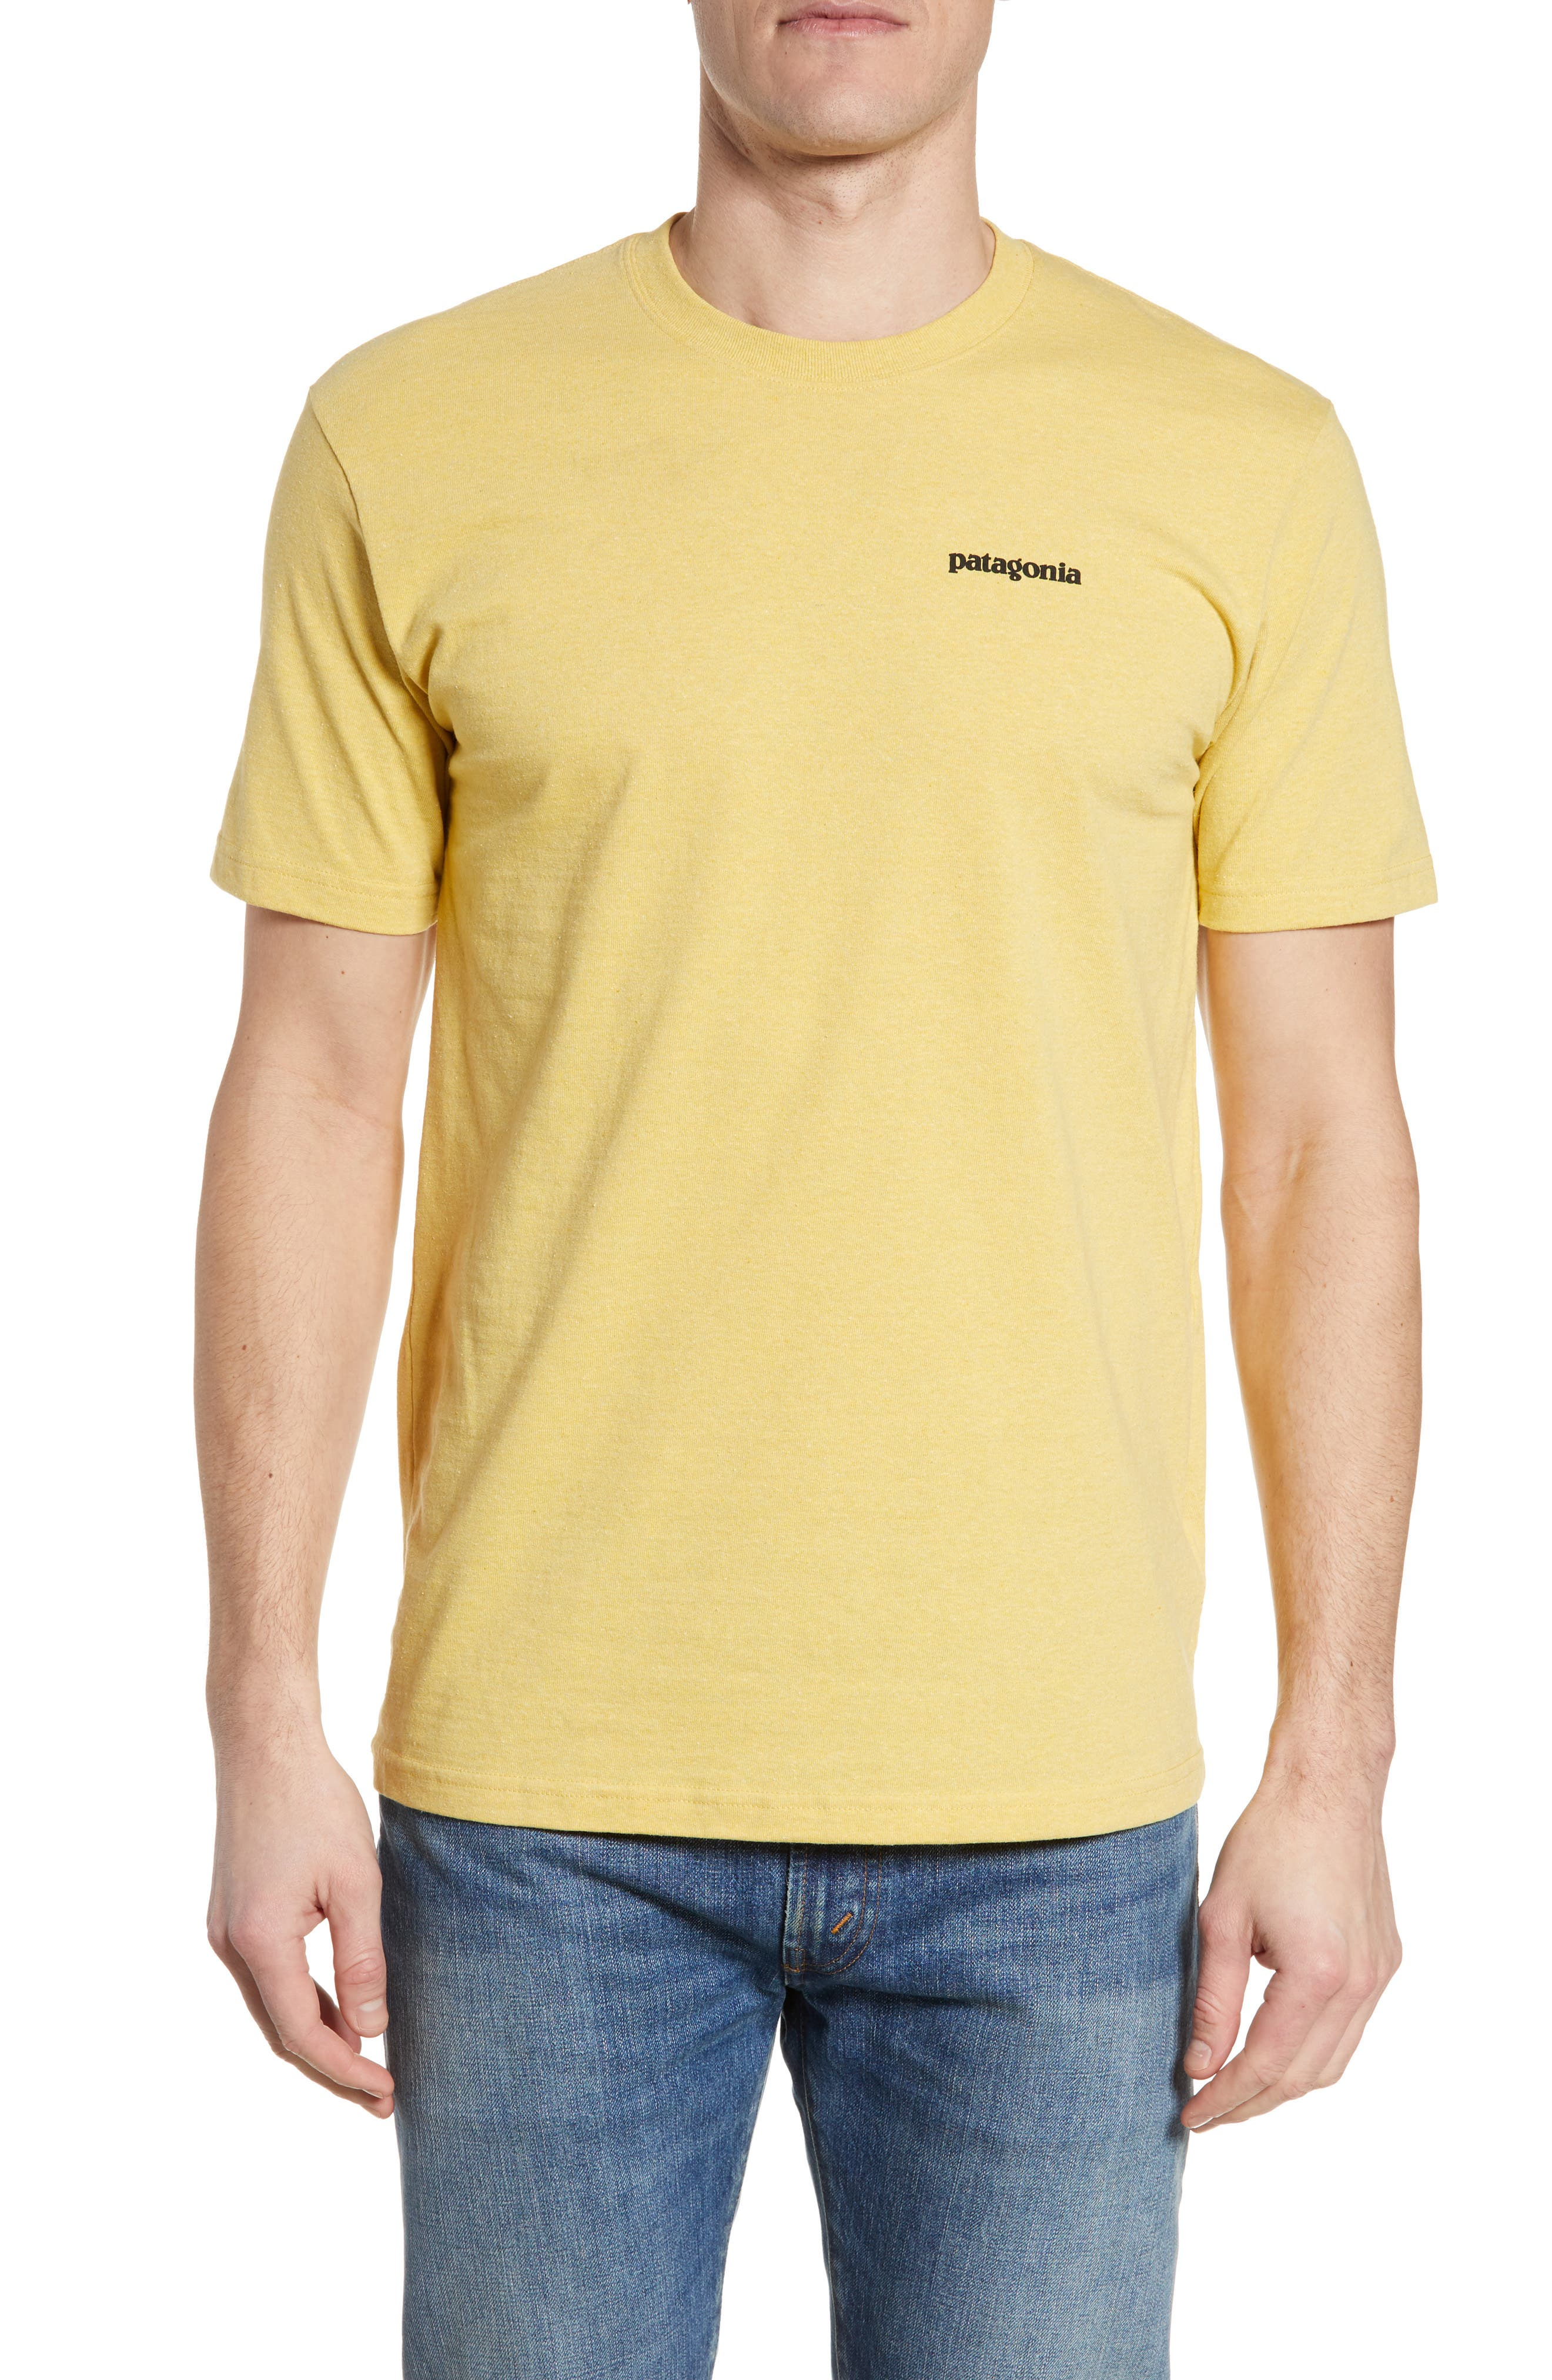 Patagonia Responsibili-Tee T-Shirt, Yellow